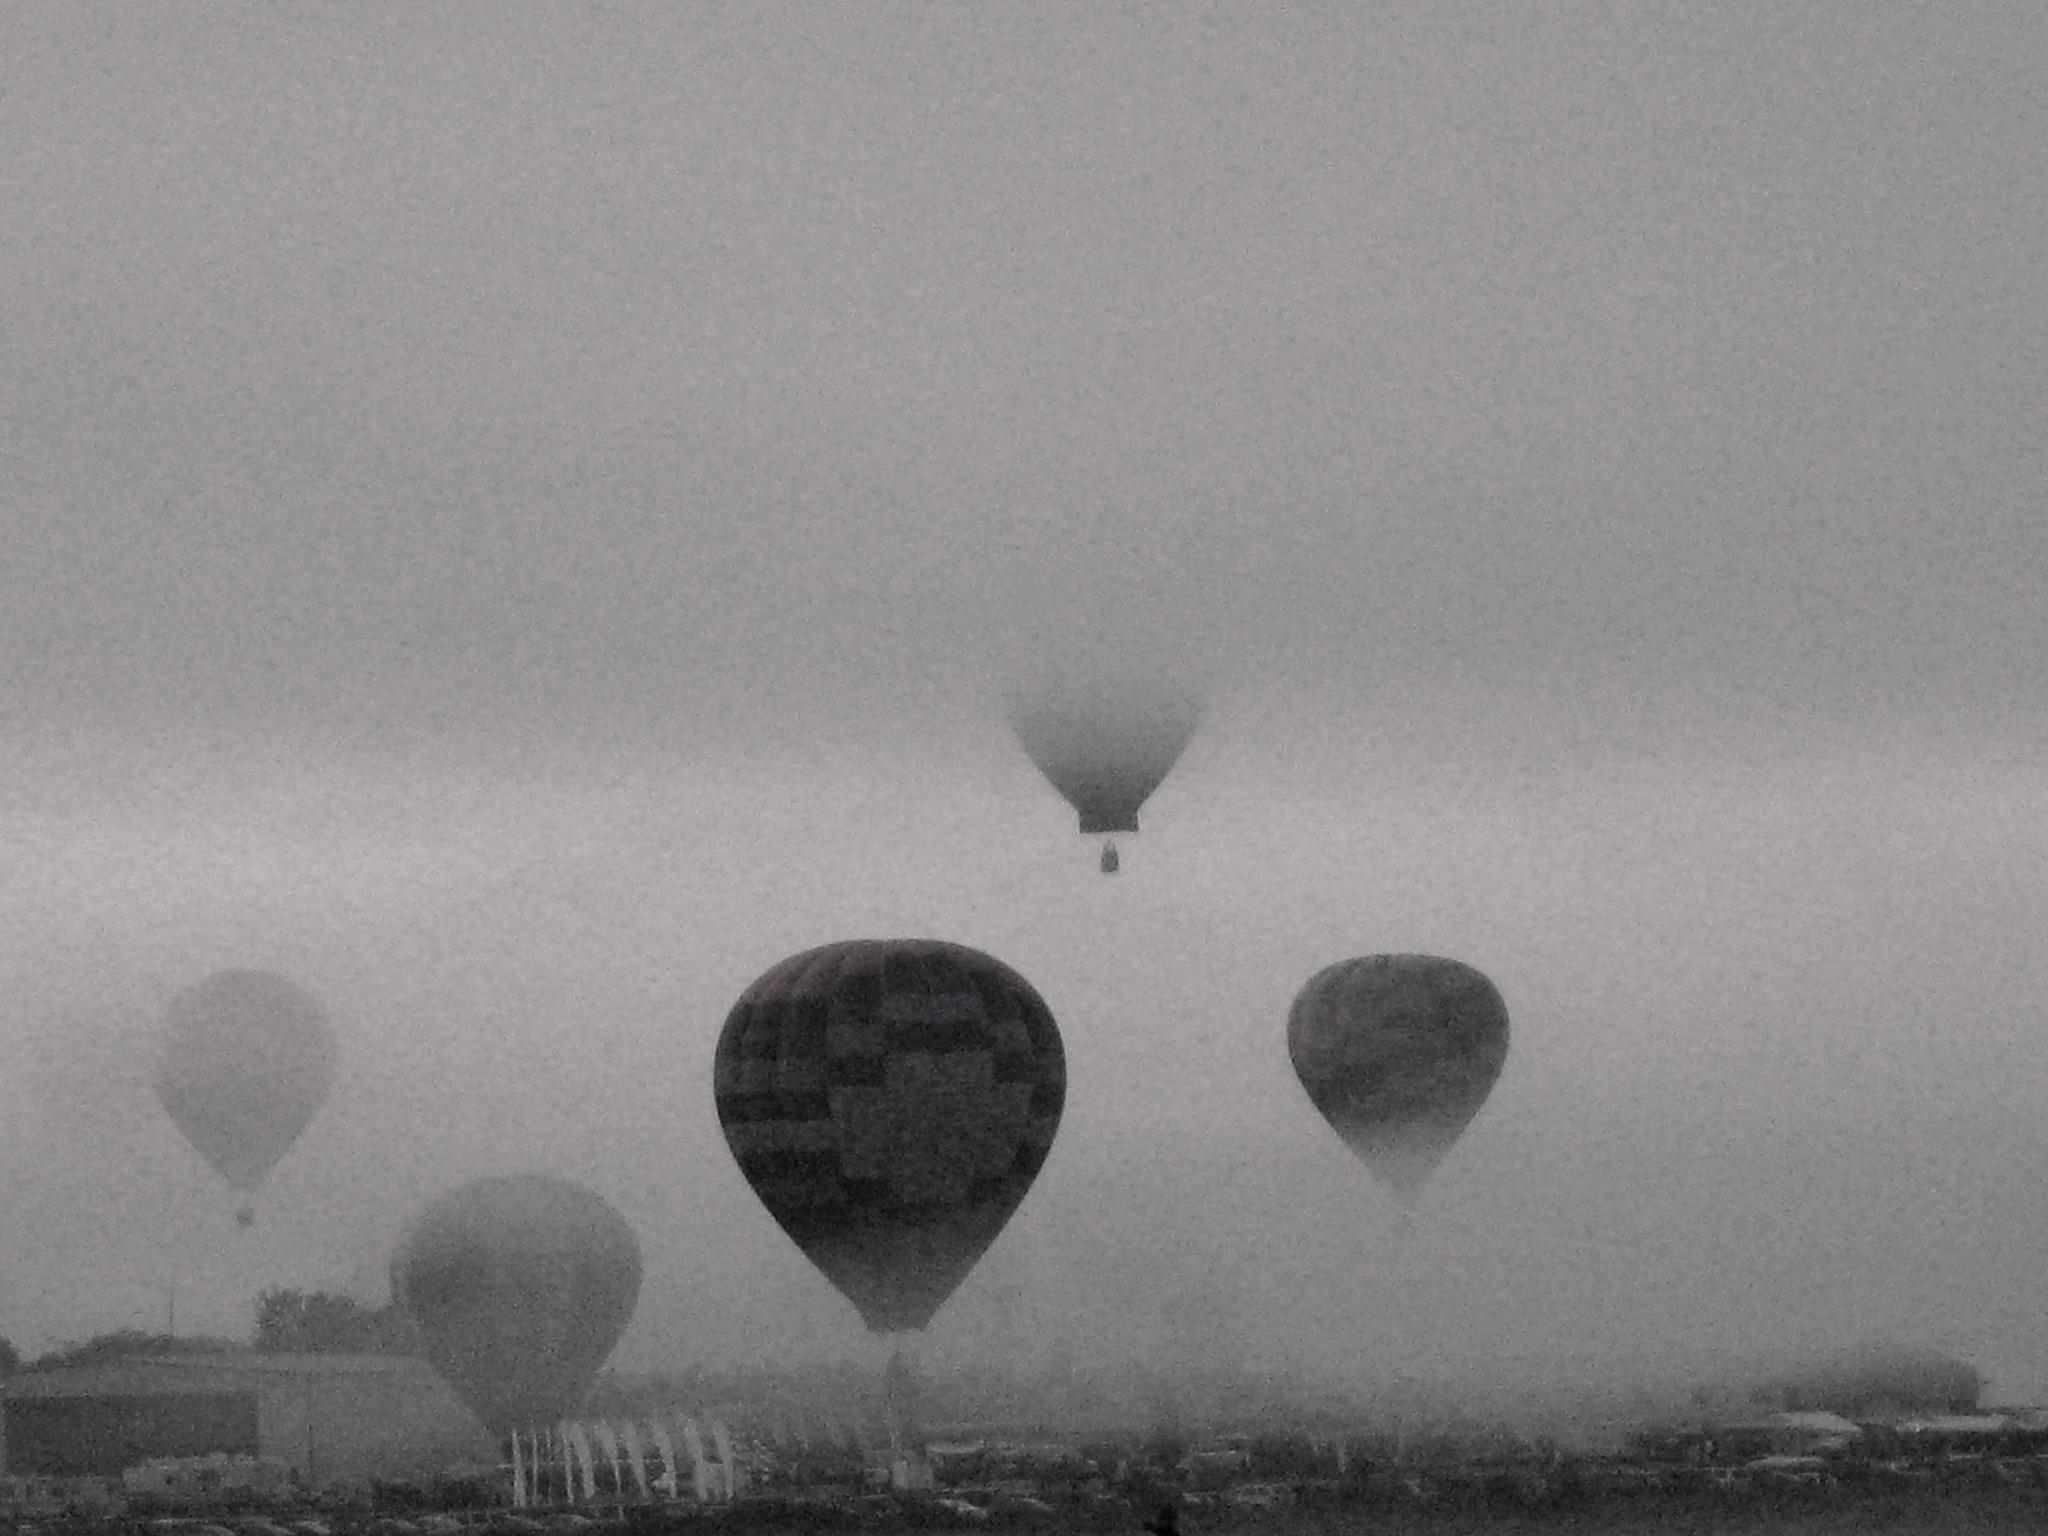 Balloons by kkaine